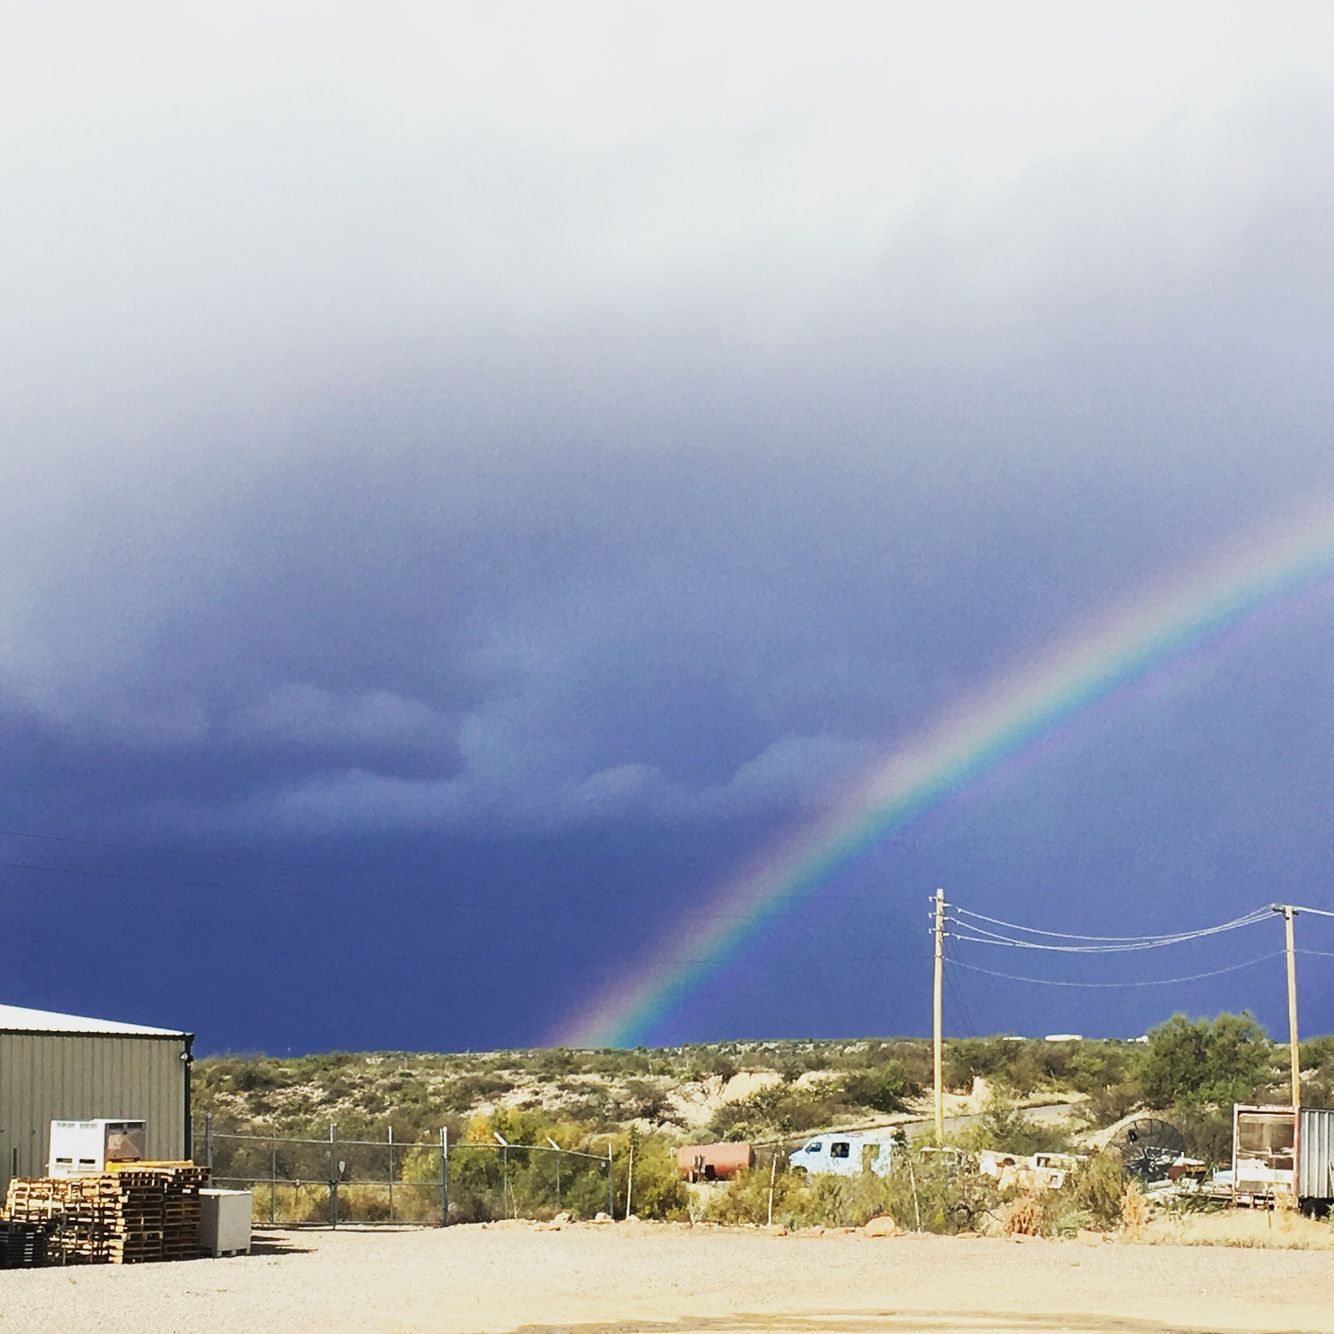 Rainbow at the winery.